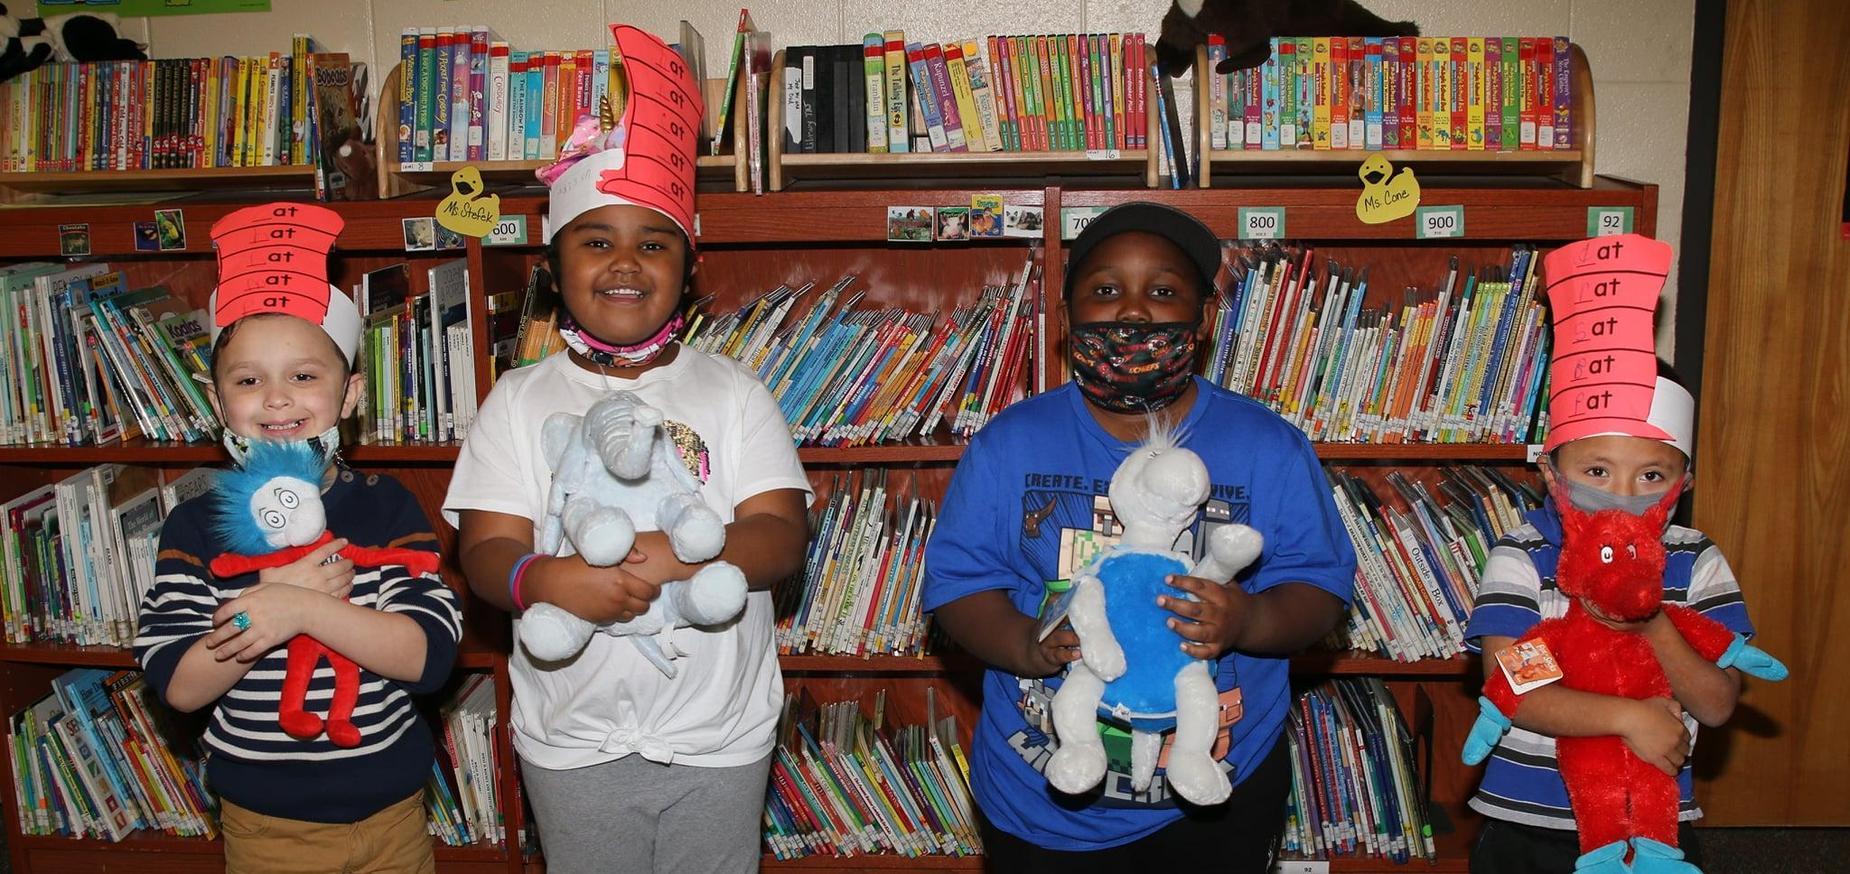 students honor Dr. Seuss's birthday